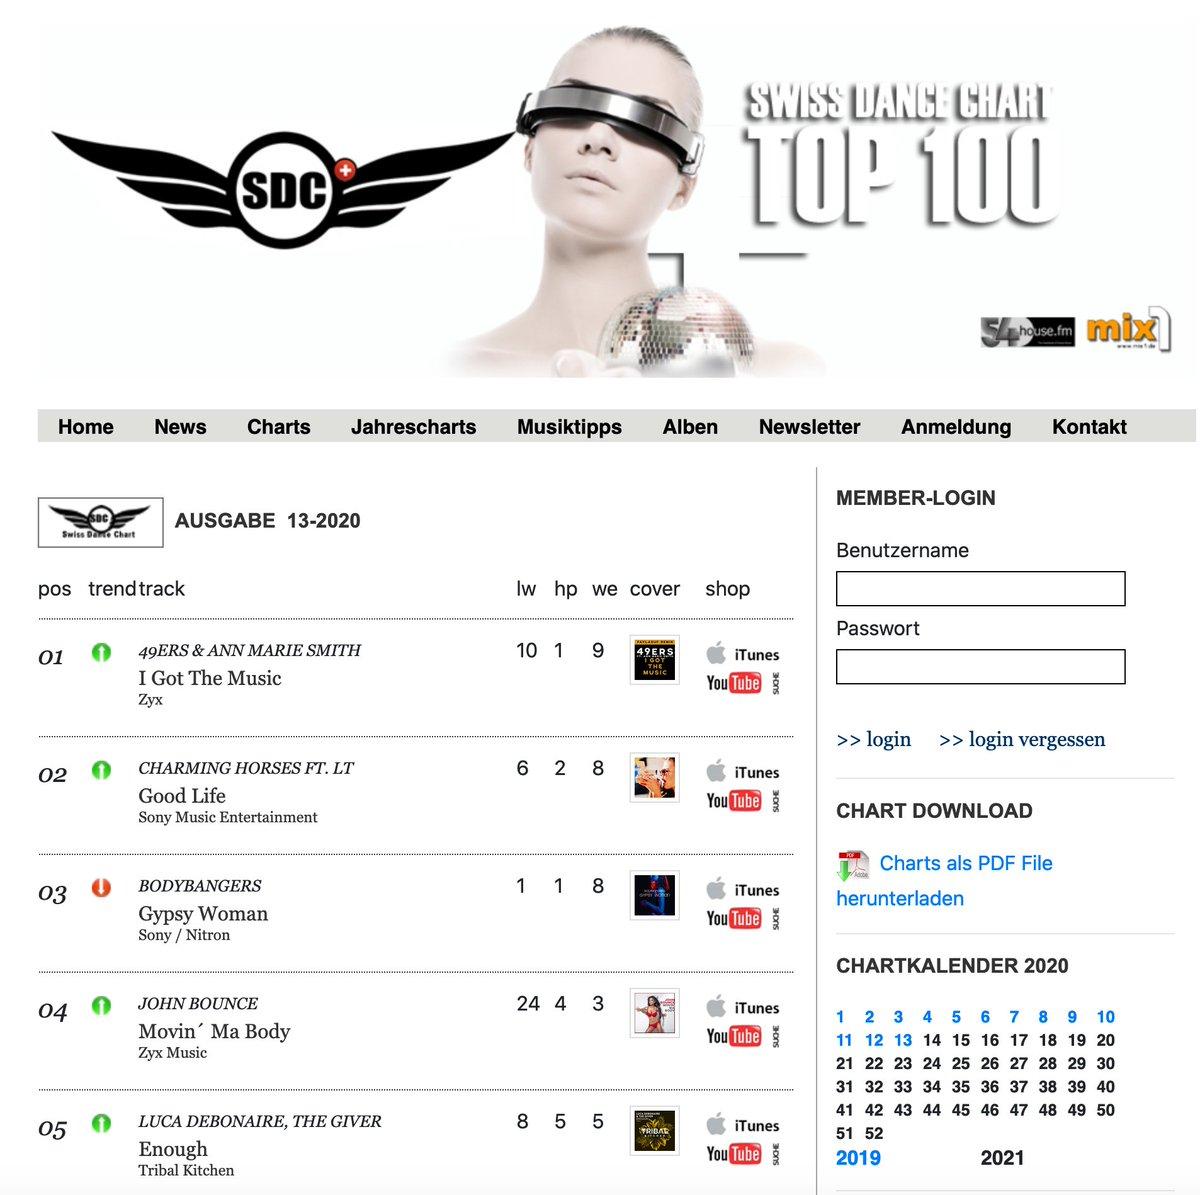 #4 Place  Top 100 Swiss Dj Dance Charts:  John Bounce - Movin ma Body ! ! !  #zyxmusic #zyxdance #johnbounce #movinmabody #chartmusic #hitmusic #radiohit #nowplaying #dance #charts #dj #djs #djlife #party #electronicmusic #club #dancemusic #newmusicpic.twitter.com/N5E97FL5DM